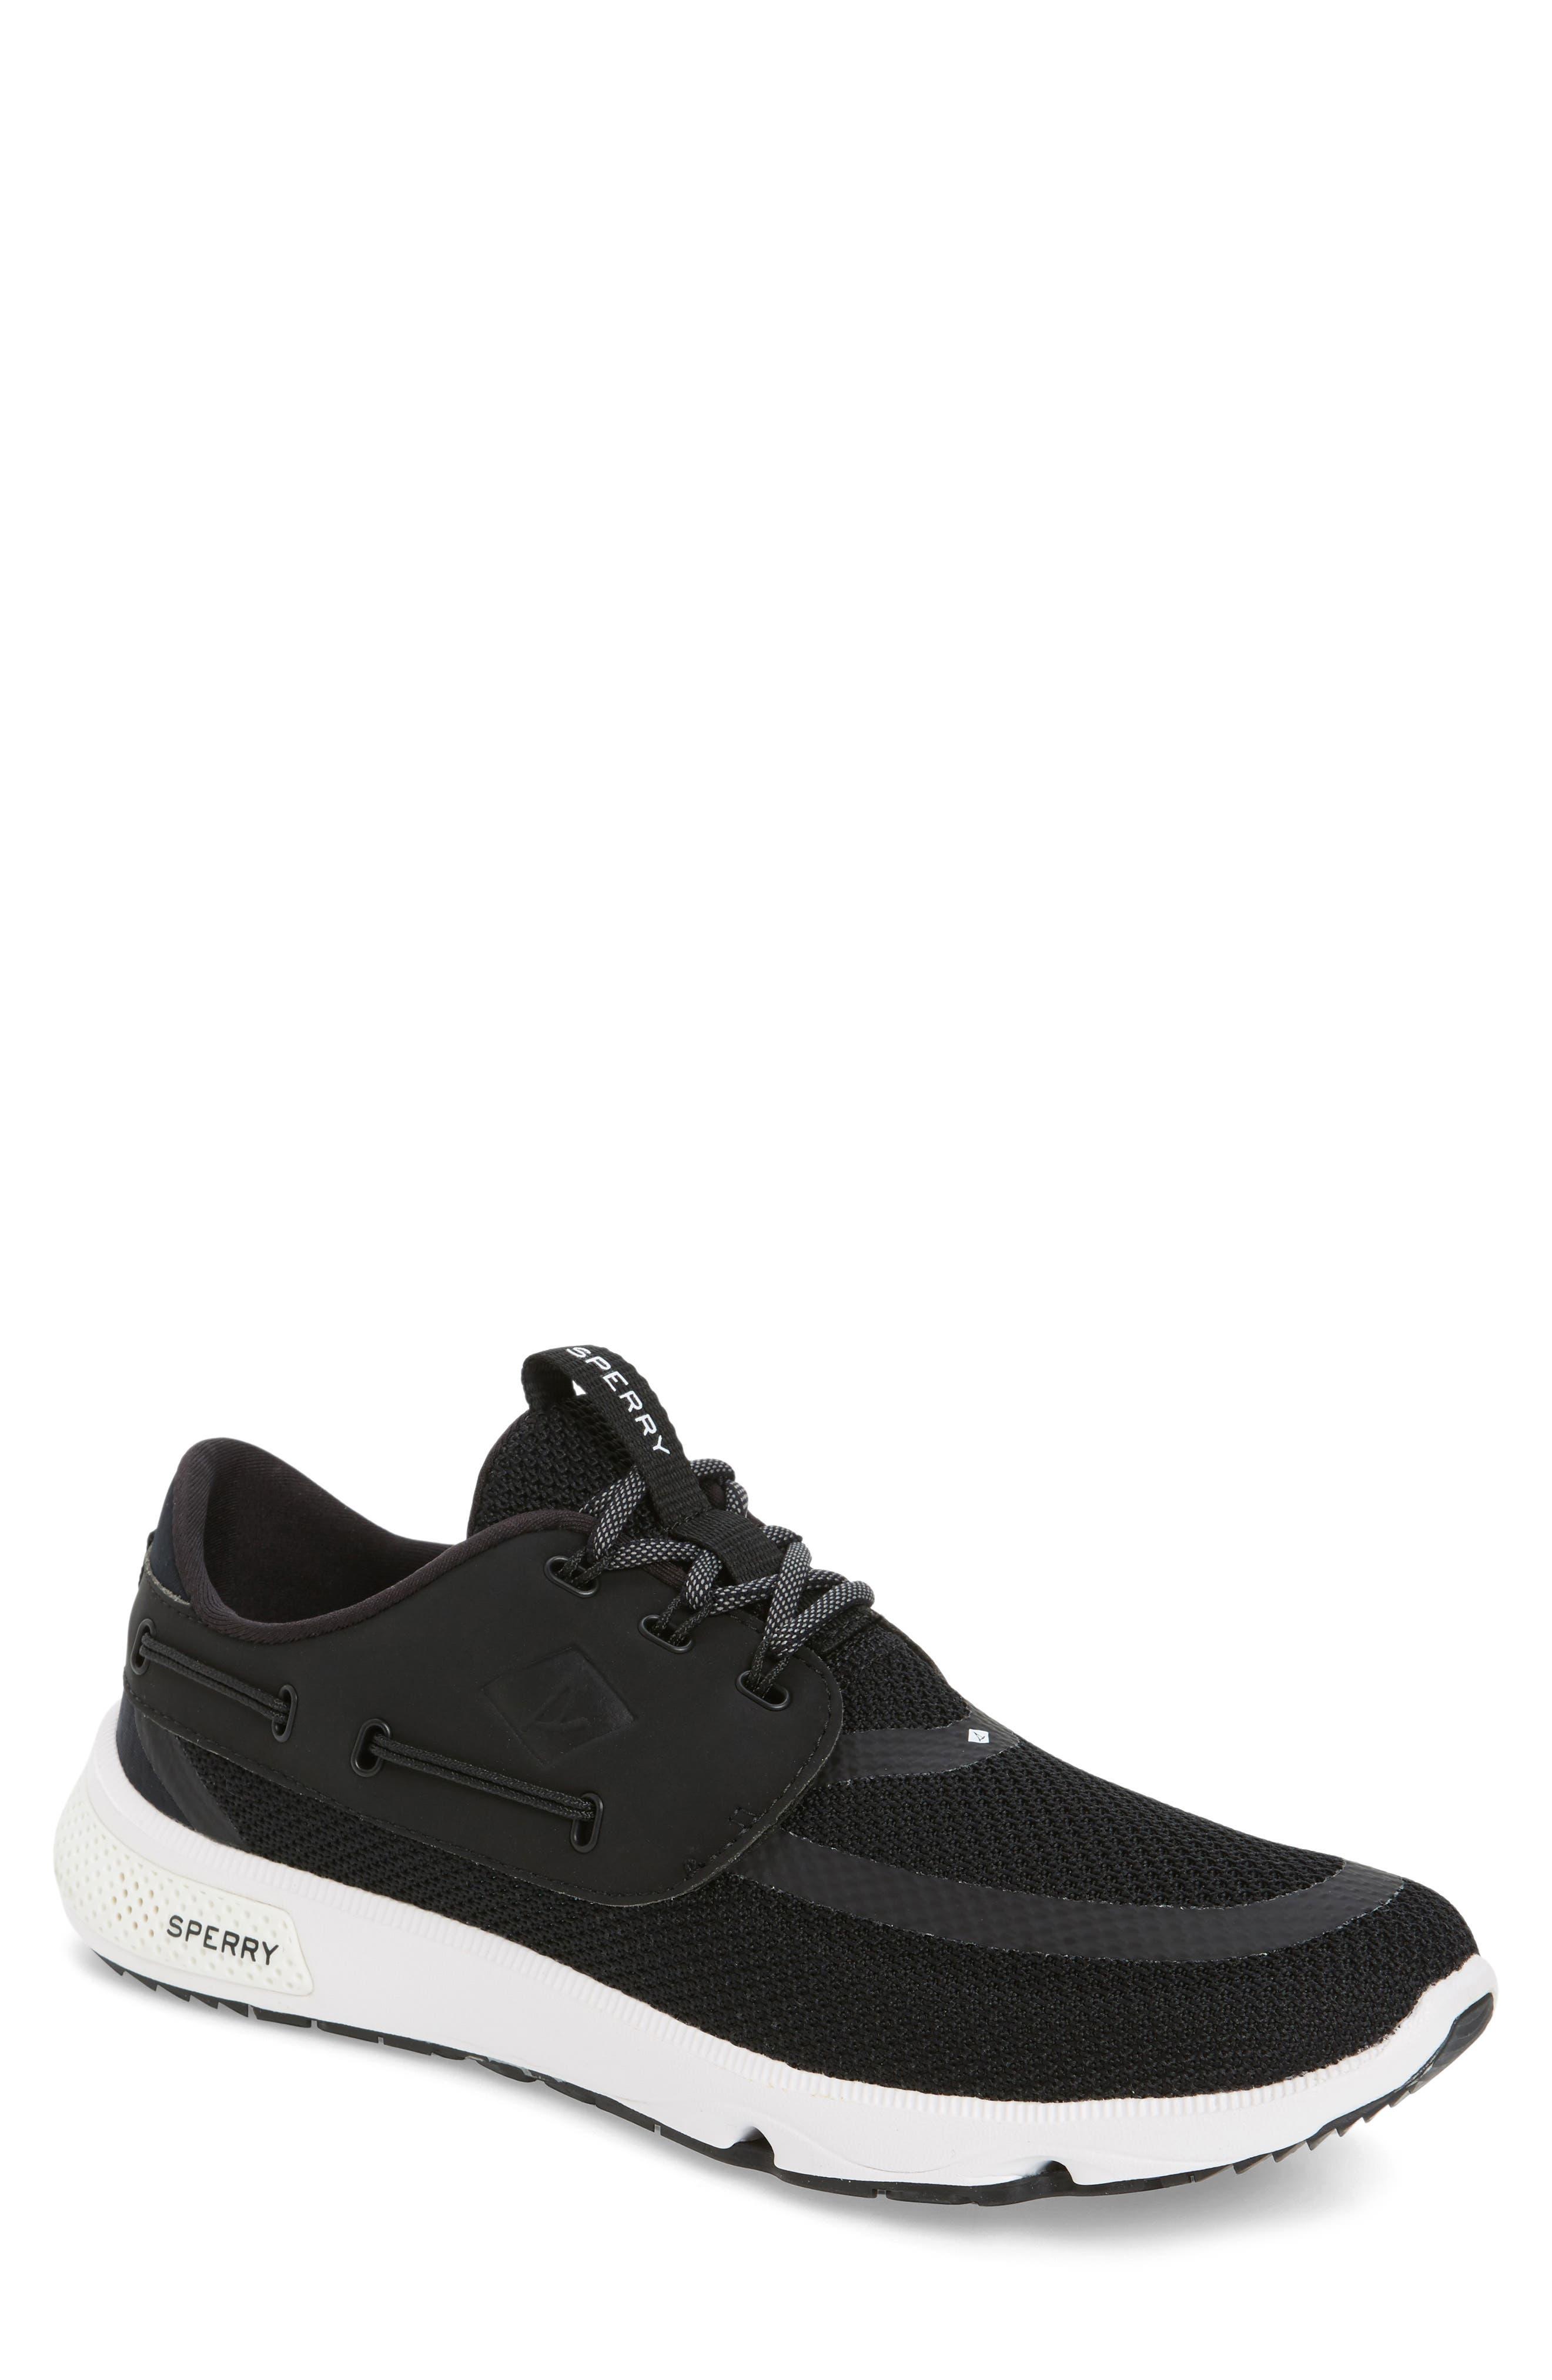 7 Seas Sneaker,                             Main thumbnail 1, color,                             001